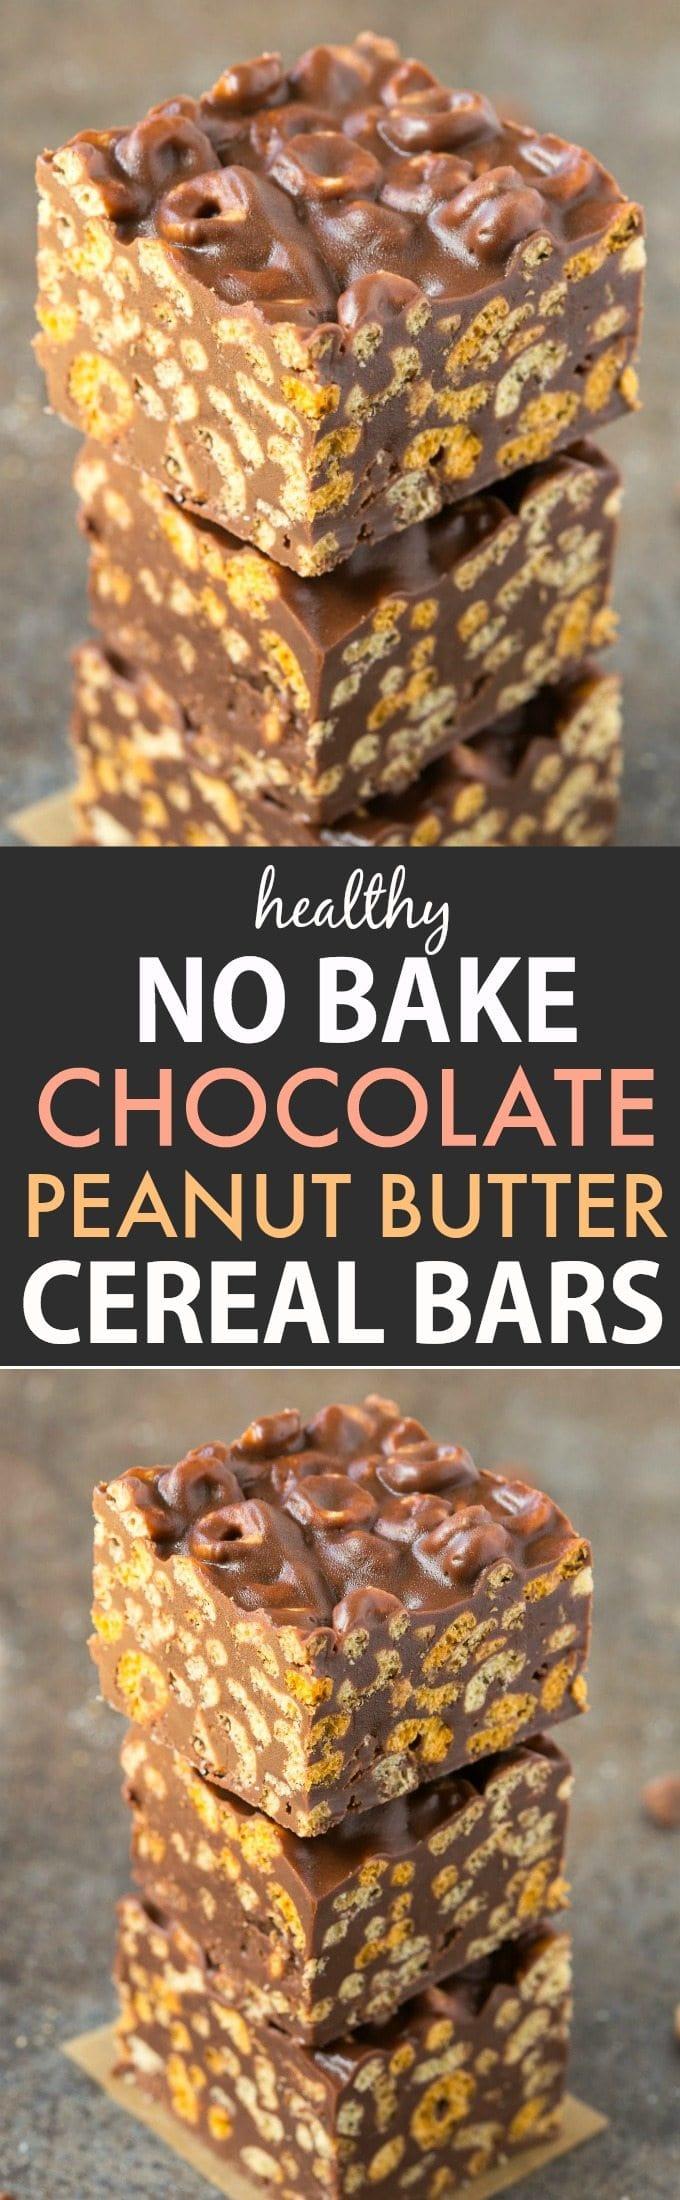 Healthy No Bake Chocolate Peanut Butter Cereal Bars (Vegan, Gluten ...